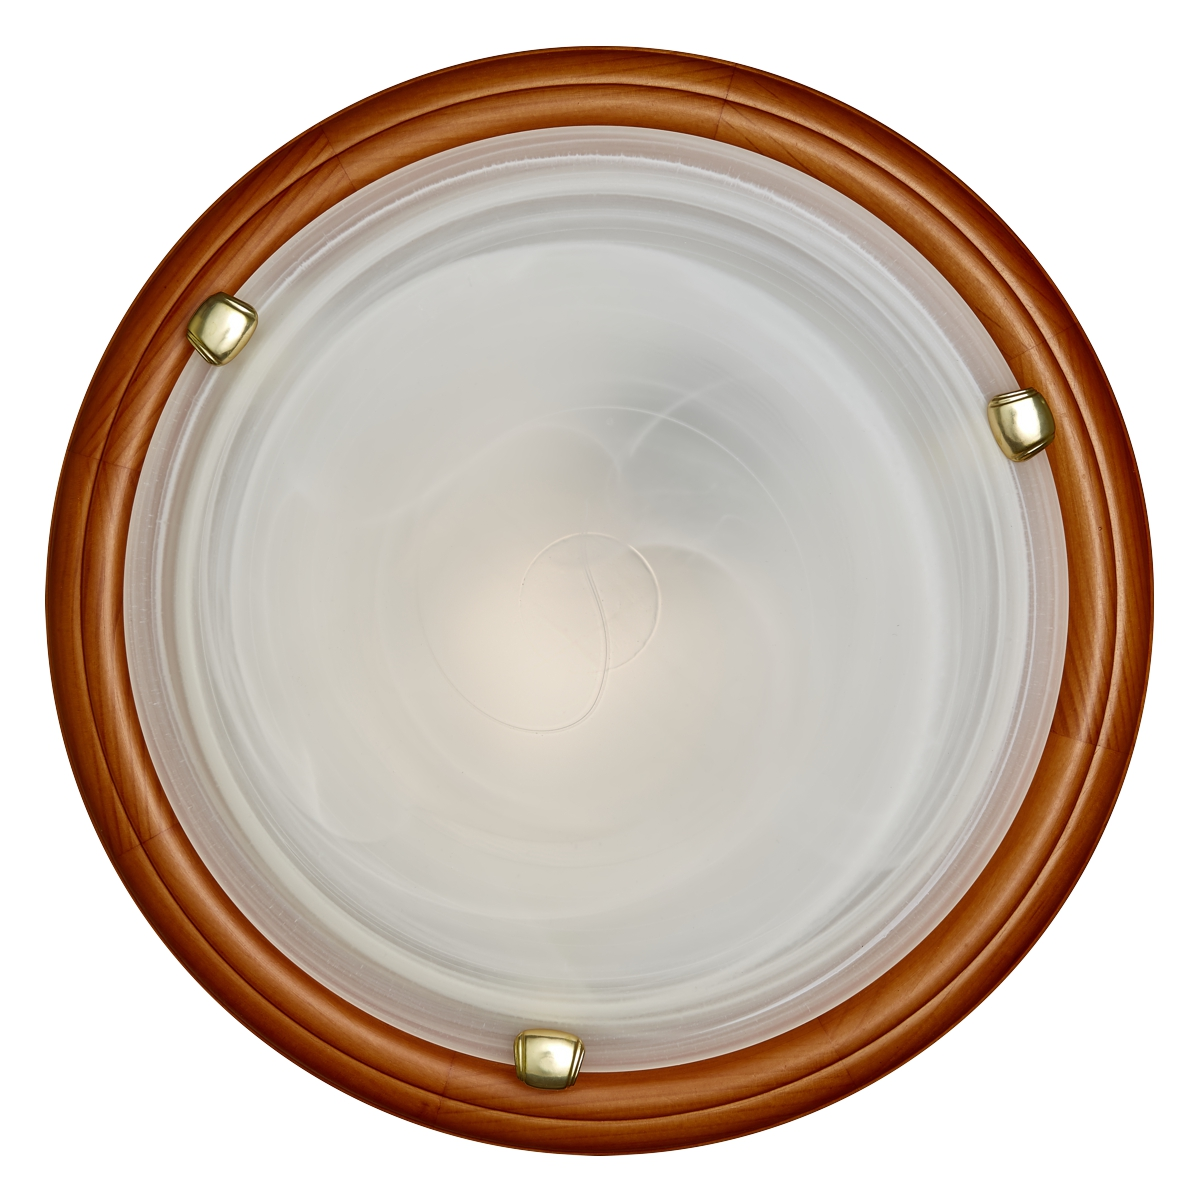 159/K SN16 000 св. орех/золото Н/п светильник E27 2*60W 220V NAPOLI Sonex